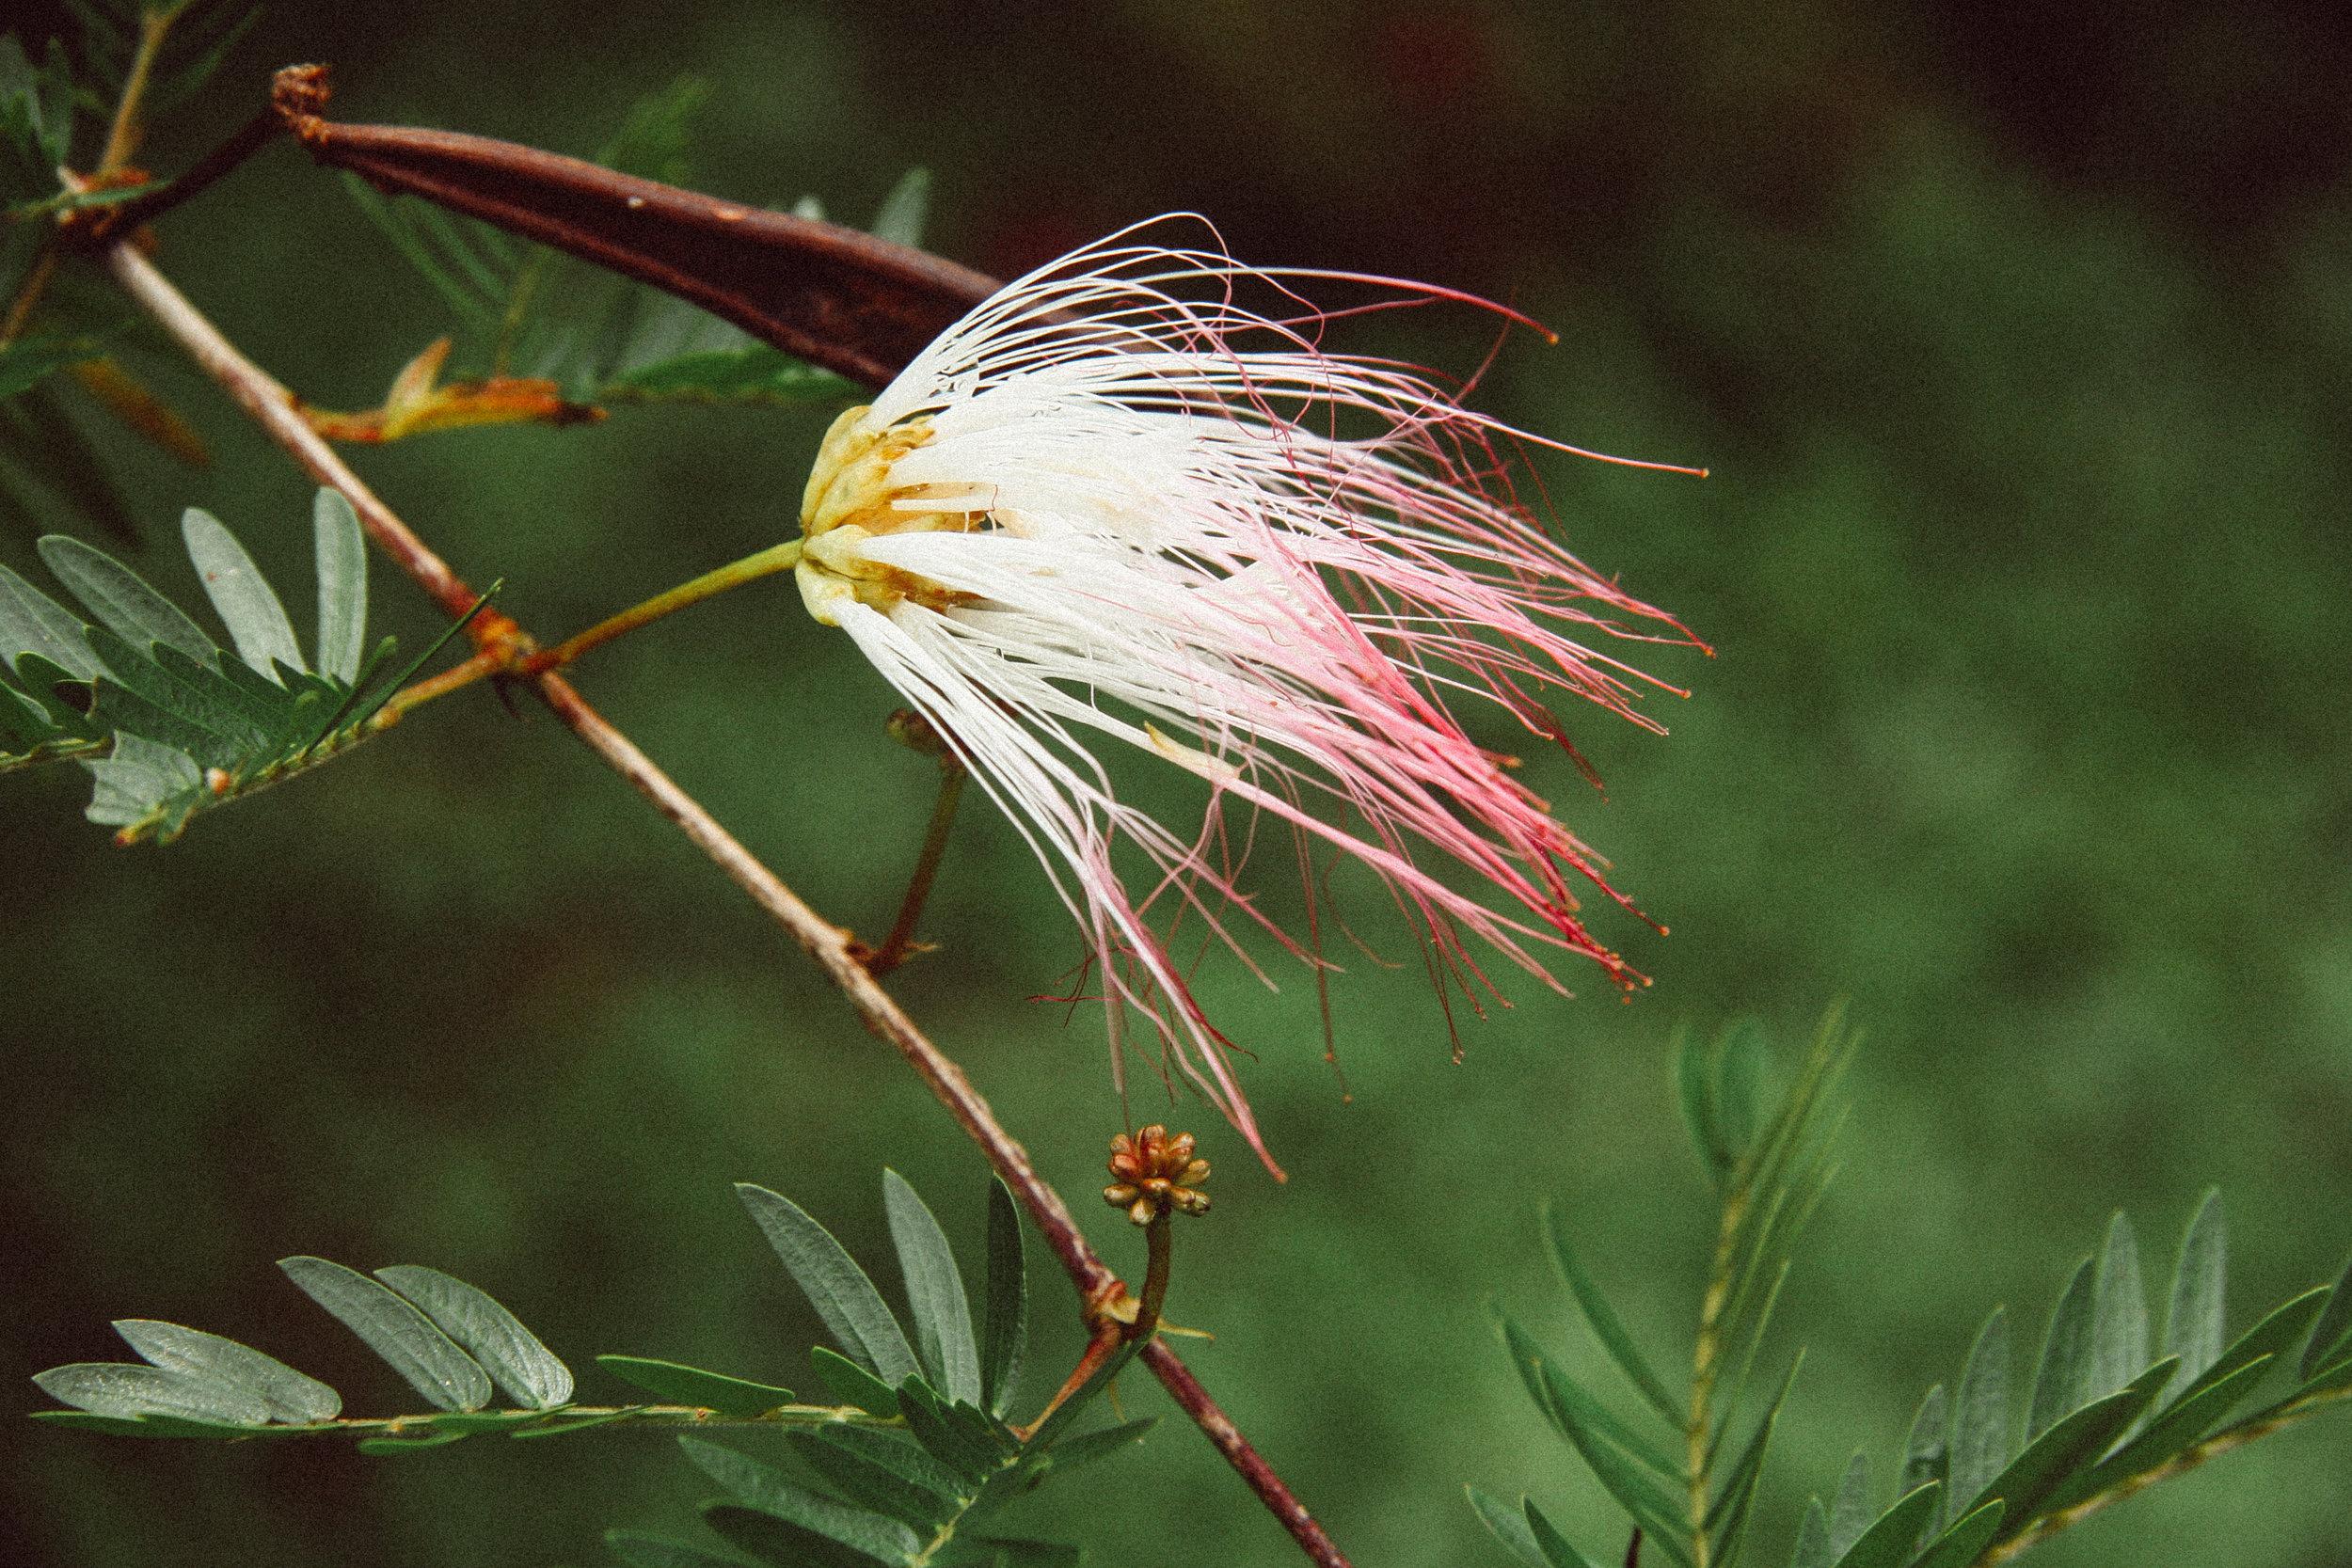 Pink Powderpuff,  Calliandra haematocephala  (Fabaceae)